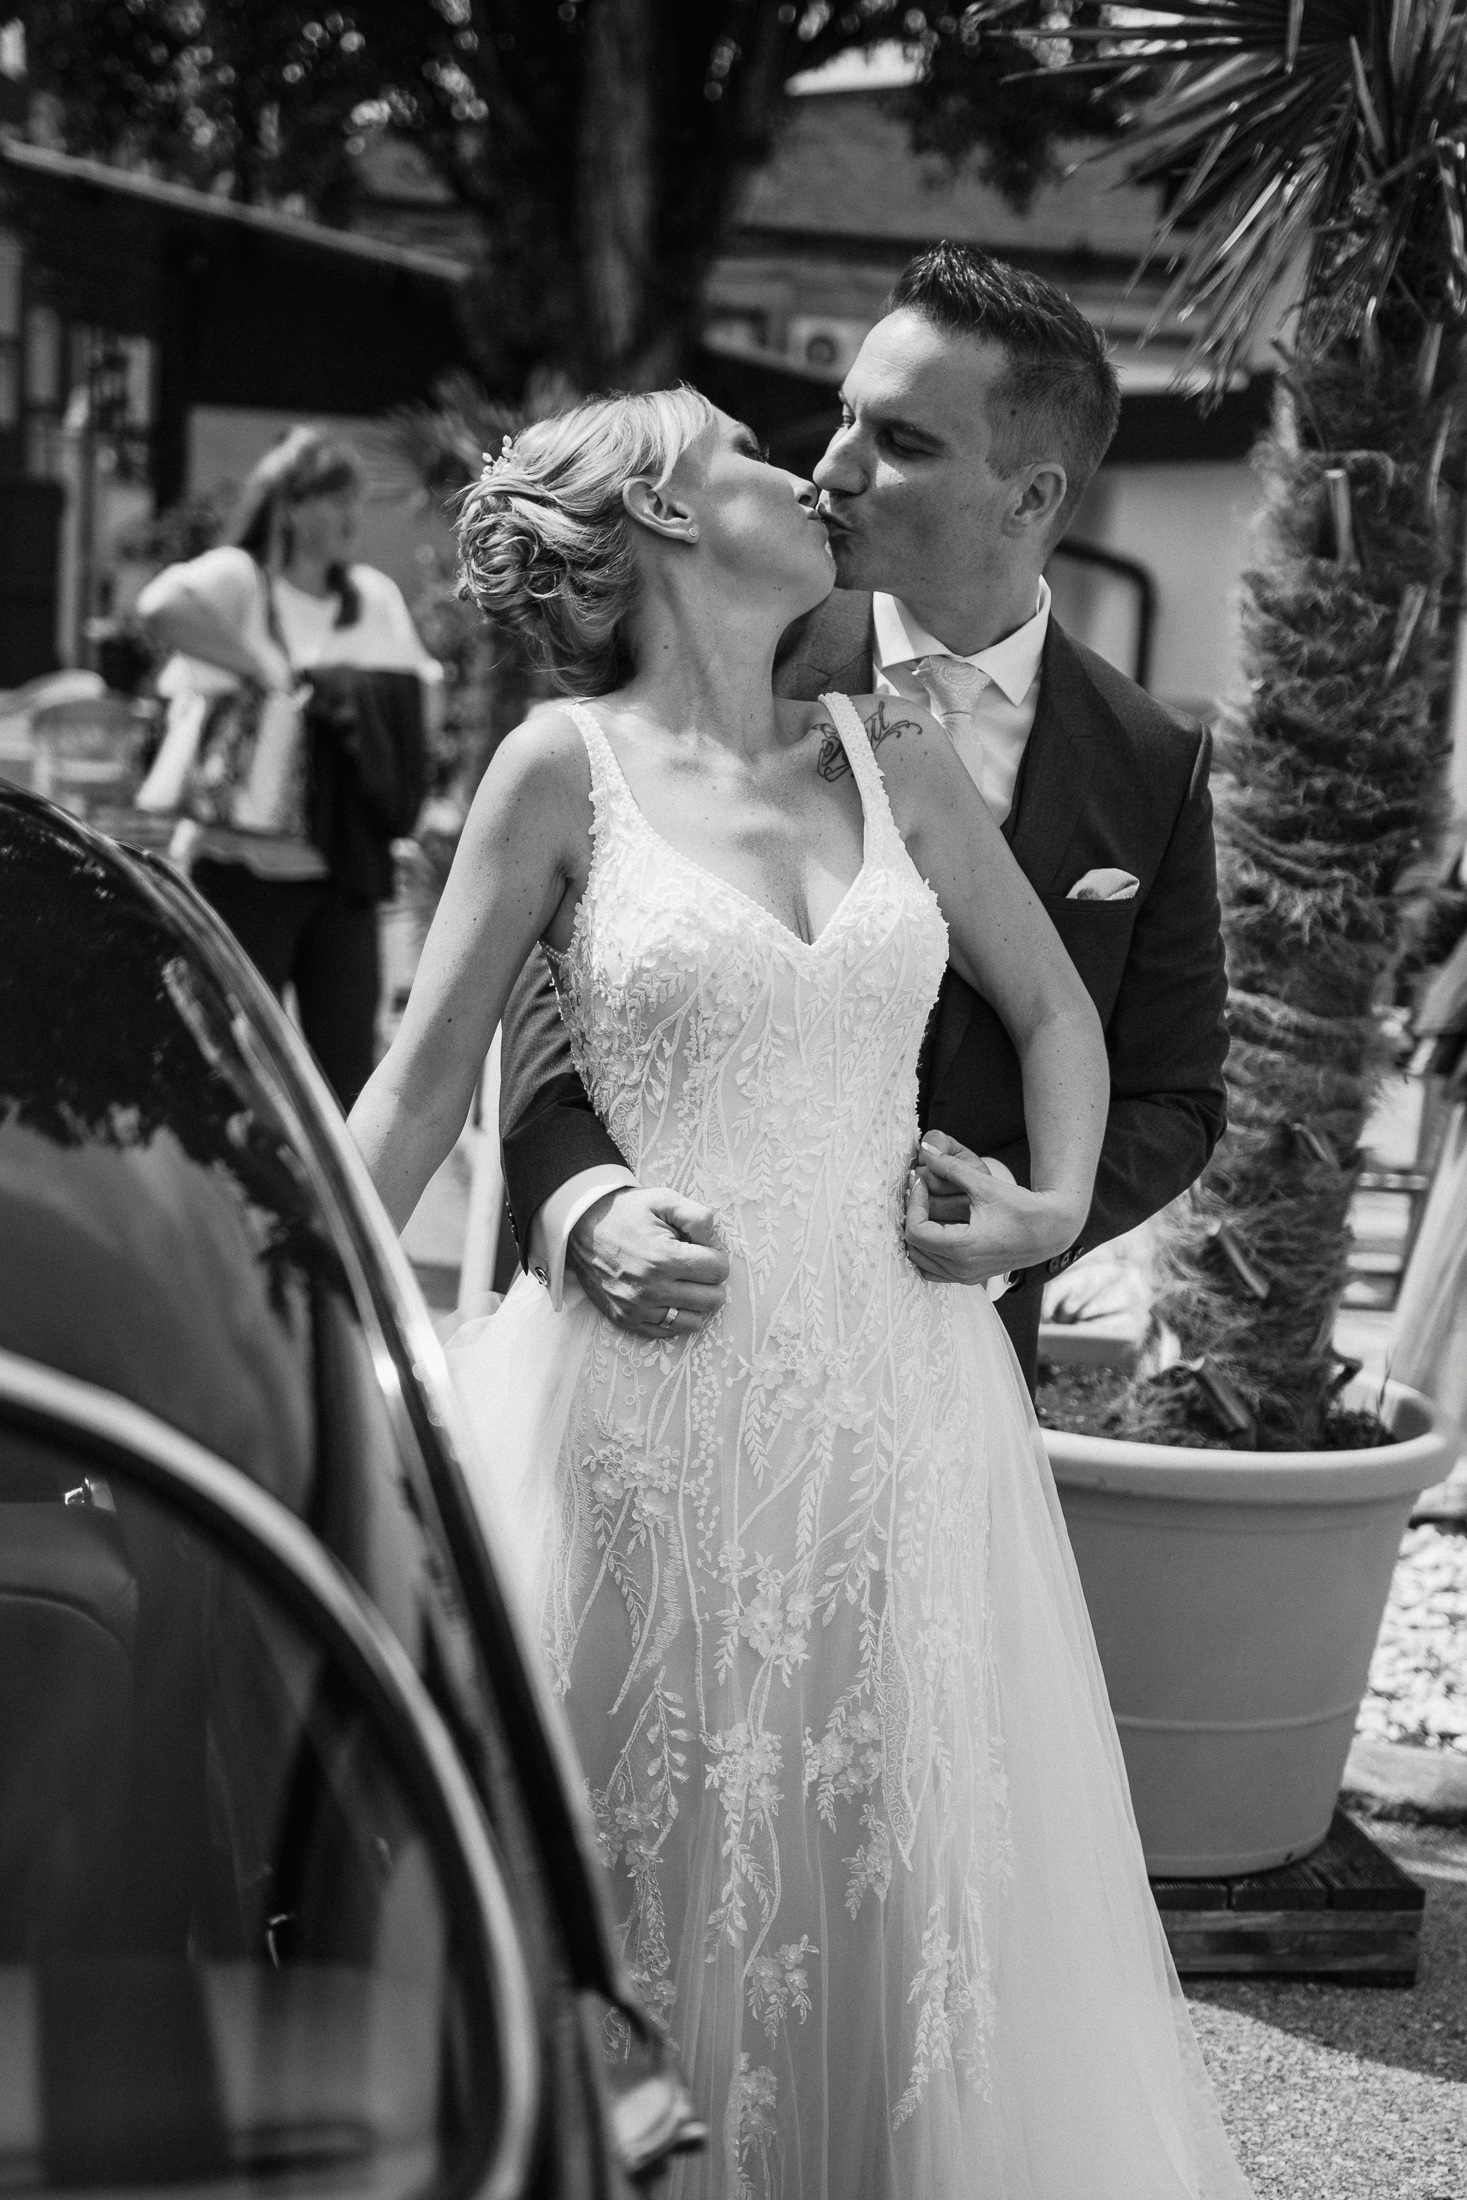 SebastianDon-Hochzeitsfotograf-Wien Umgebung-24.jpg